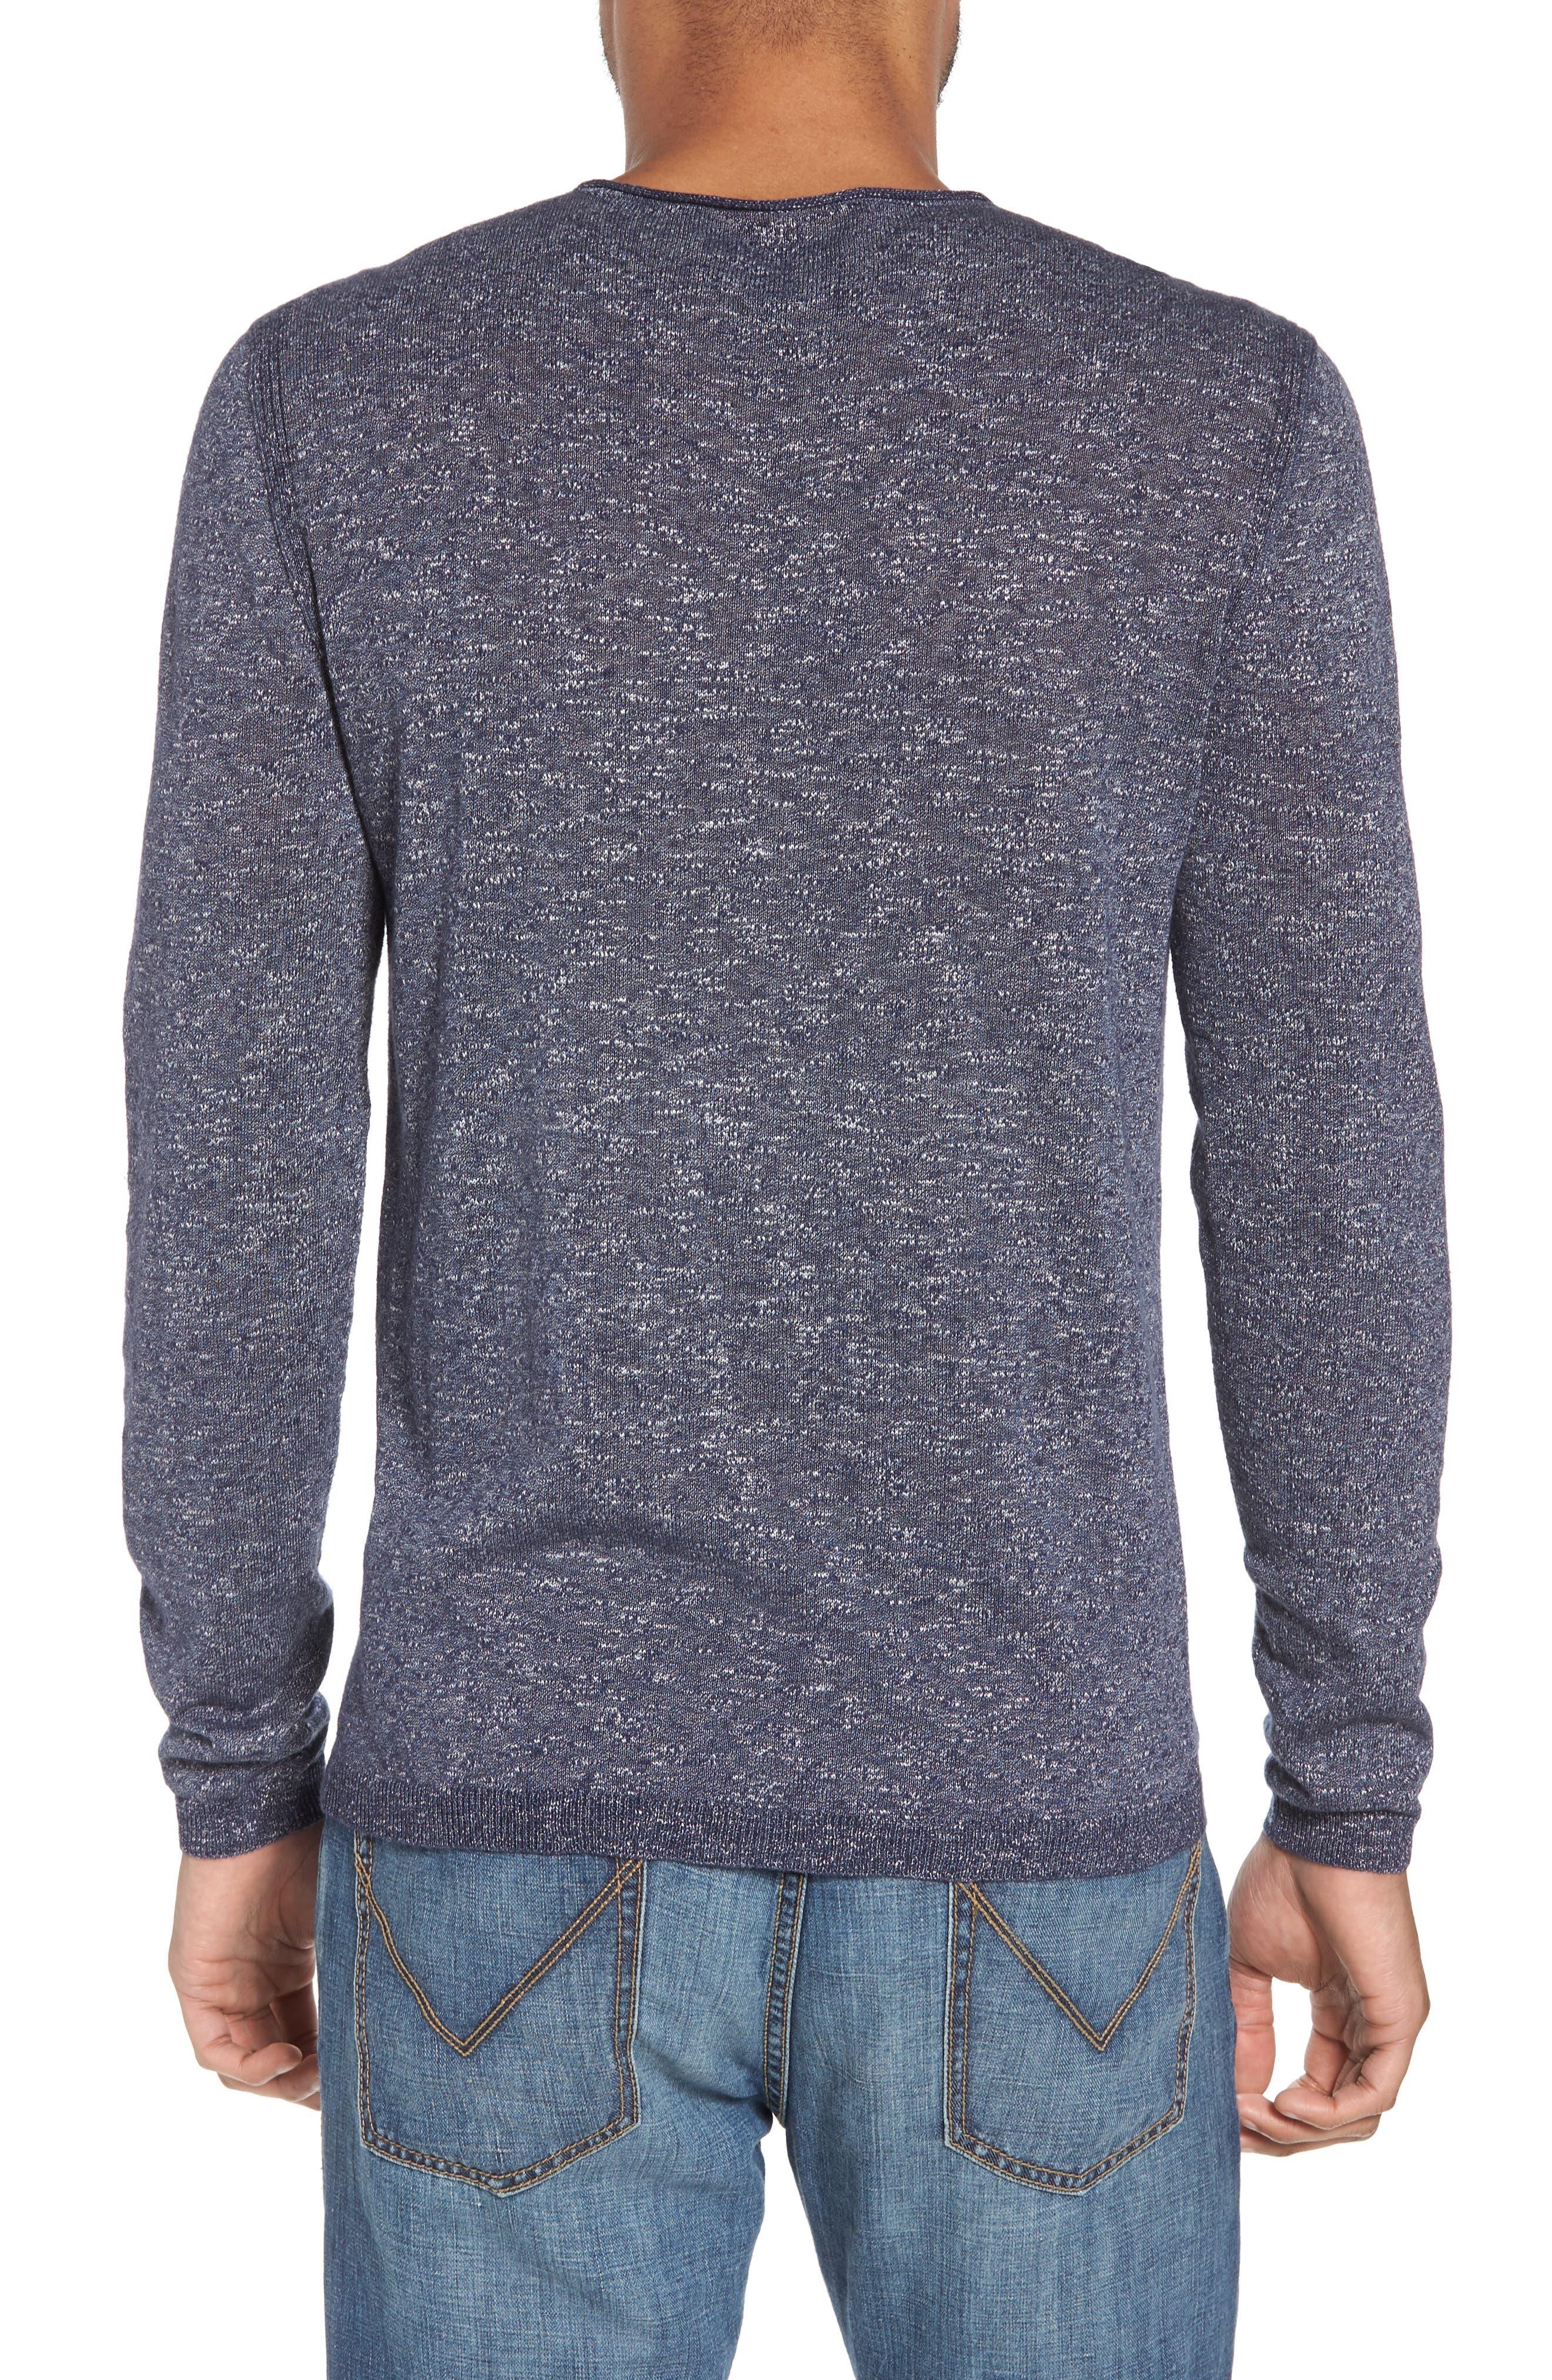 Slim Fit Cotton Blend Sweater,                             Alternate thumbnail 2, color,                             Officer Blue